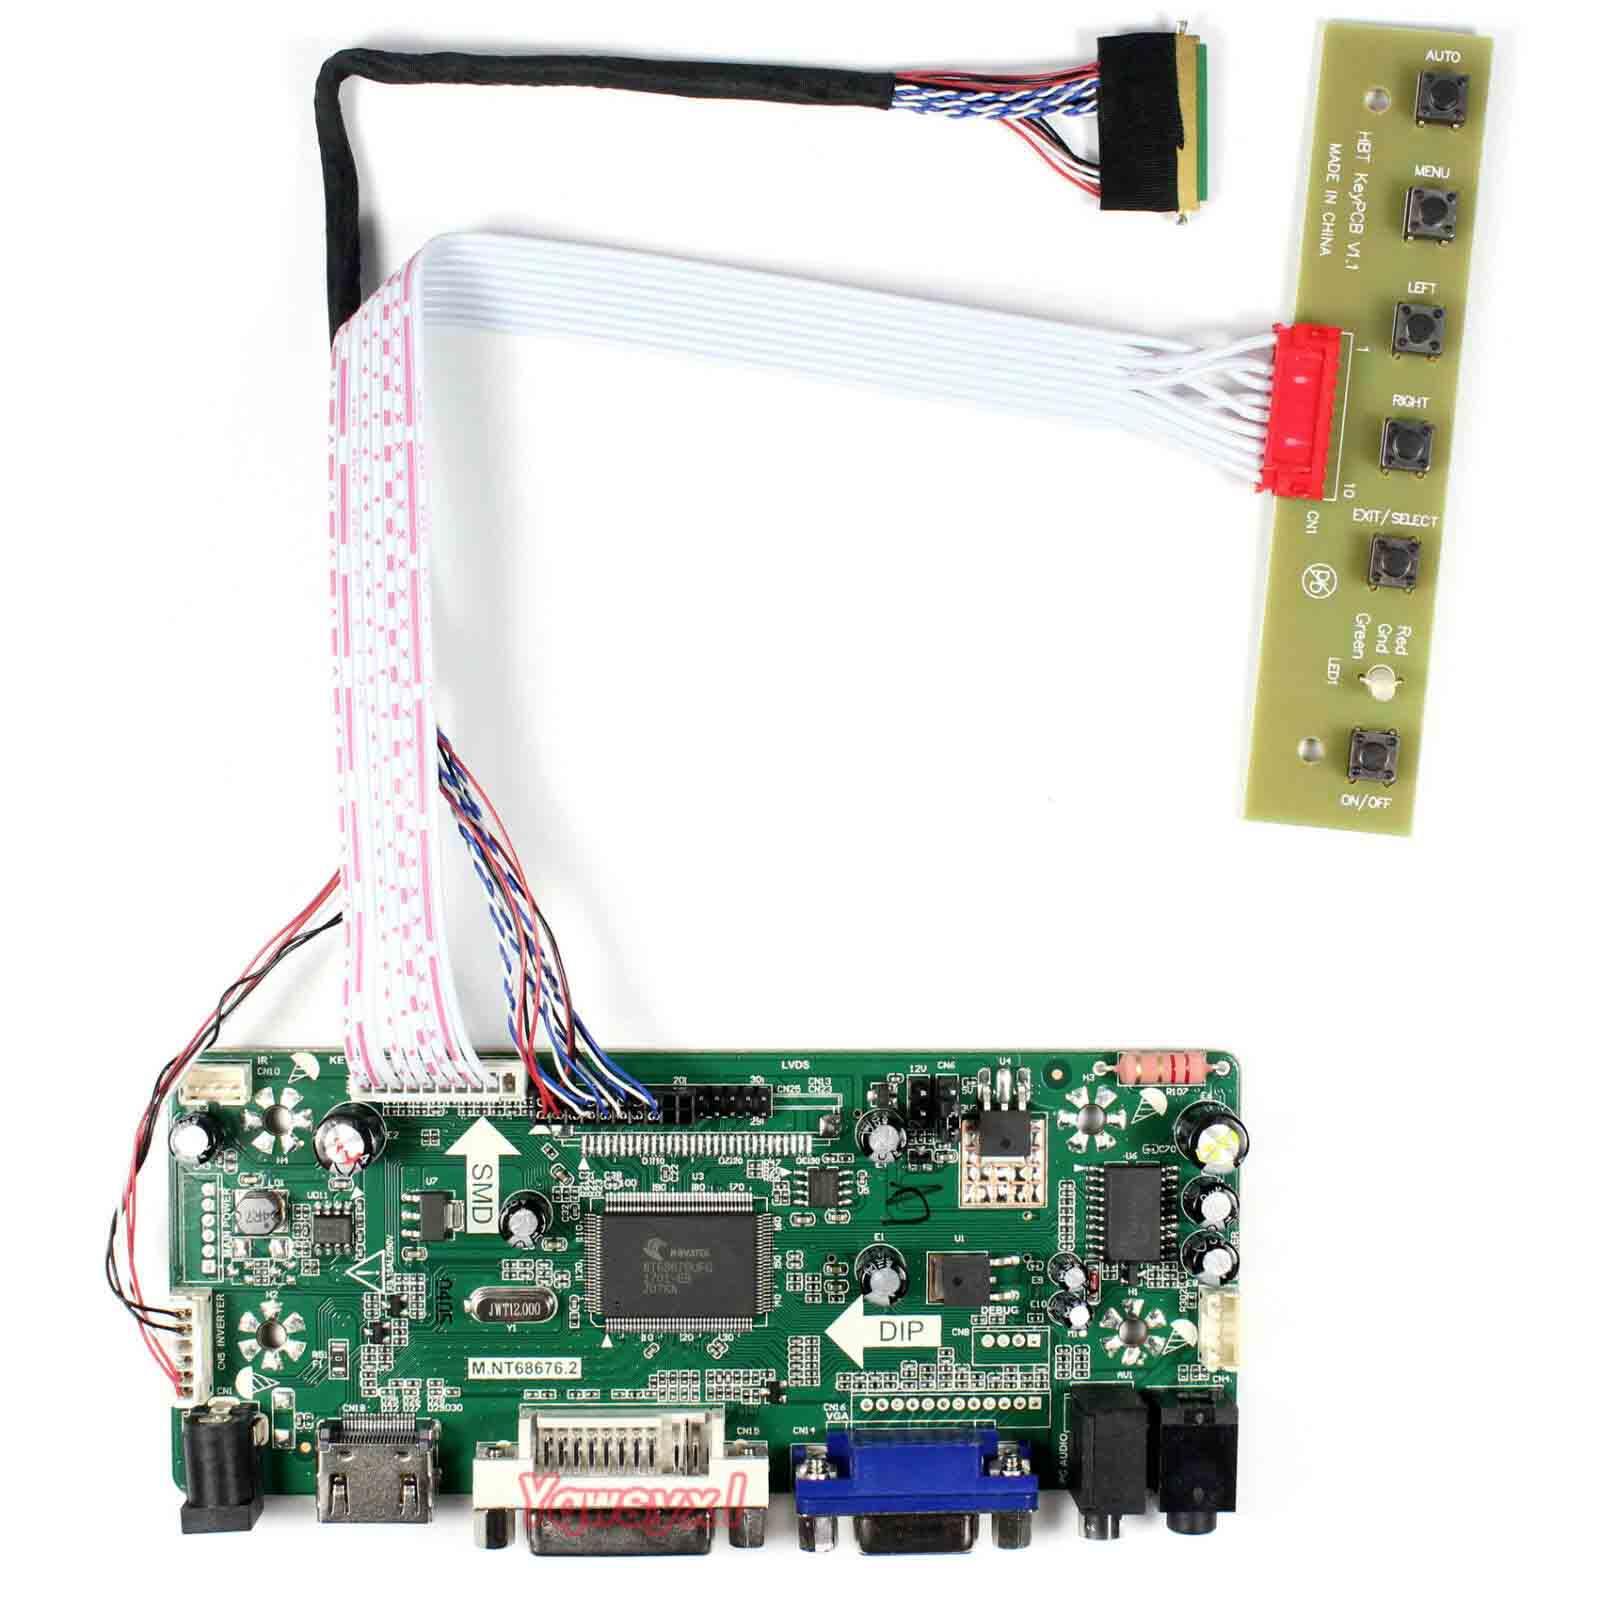 Yqwsyxl плата управления монитор комплект для B140XW01 V0 B140XW01 V2 HDMI + DVI + VGA ЖК-светодиодный экран управления Лер плата драйвер